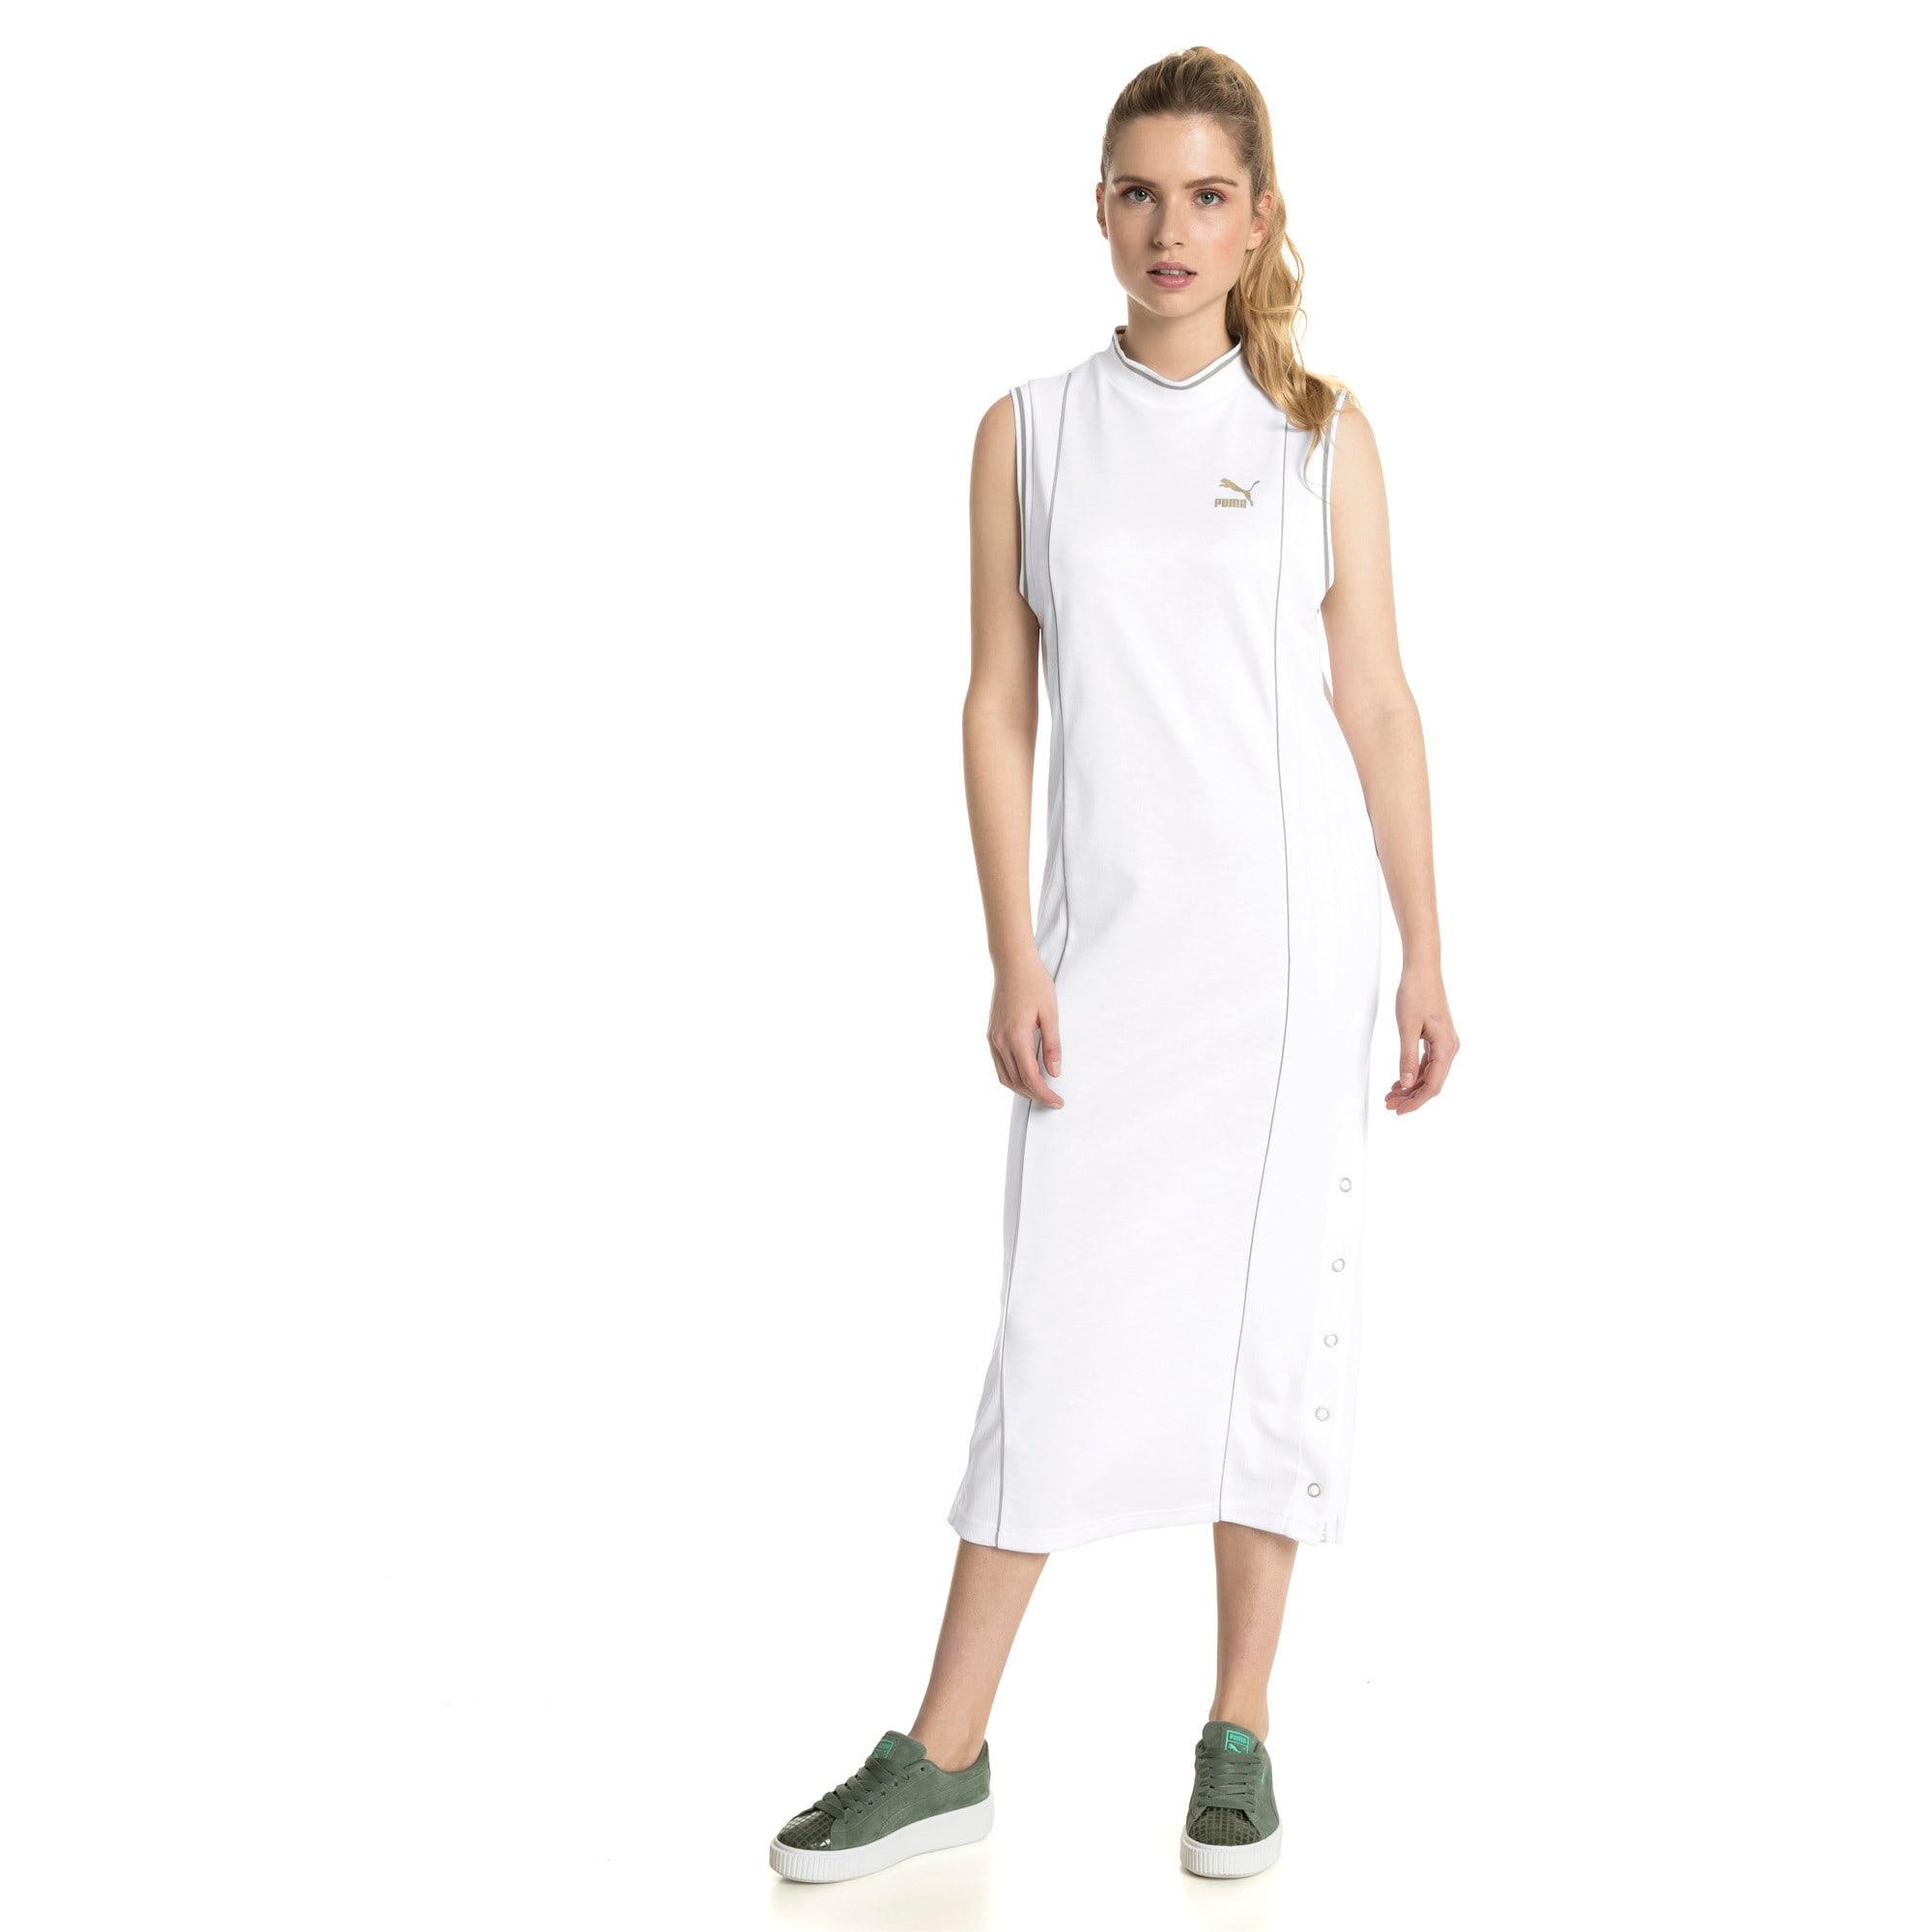 Thumbnail 3 of Retro Women's Dress, Puma White, medium-IND